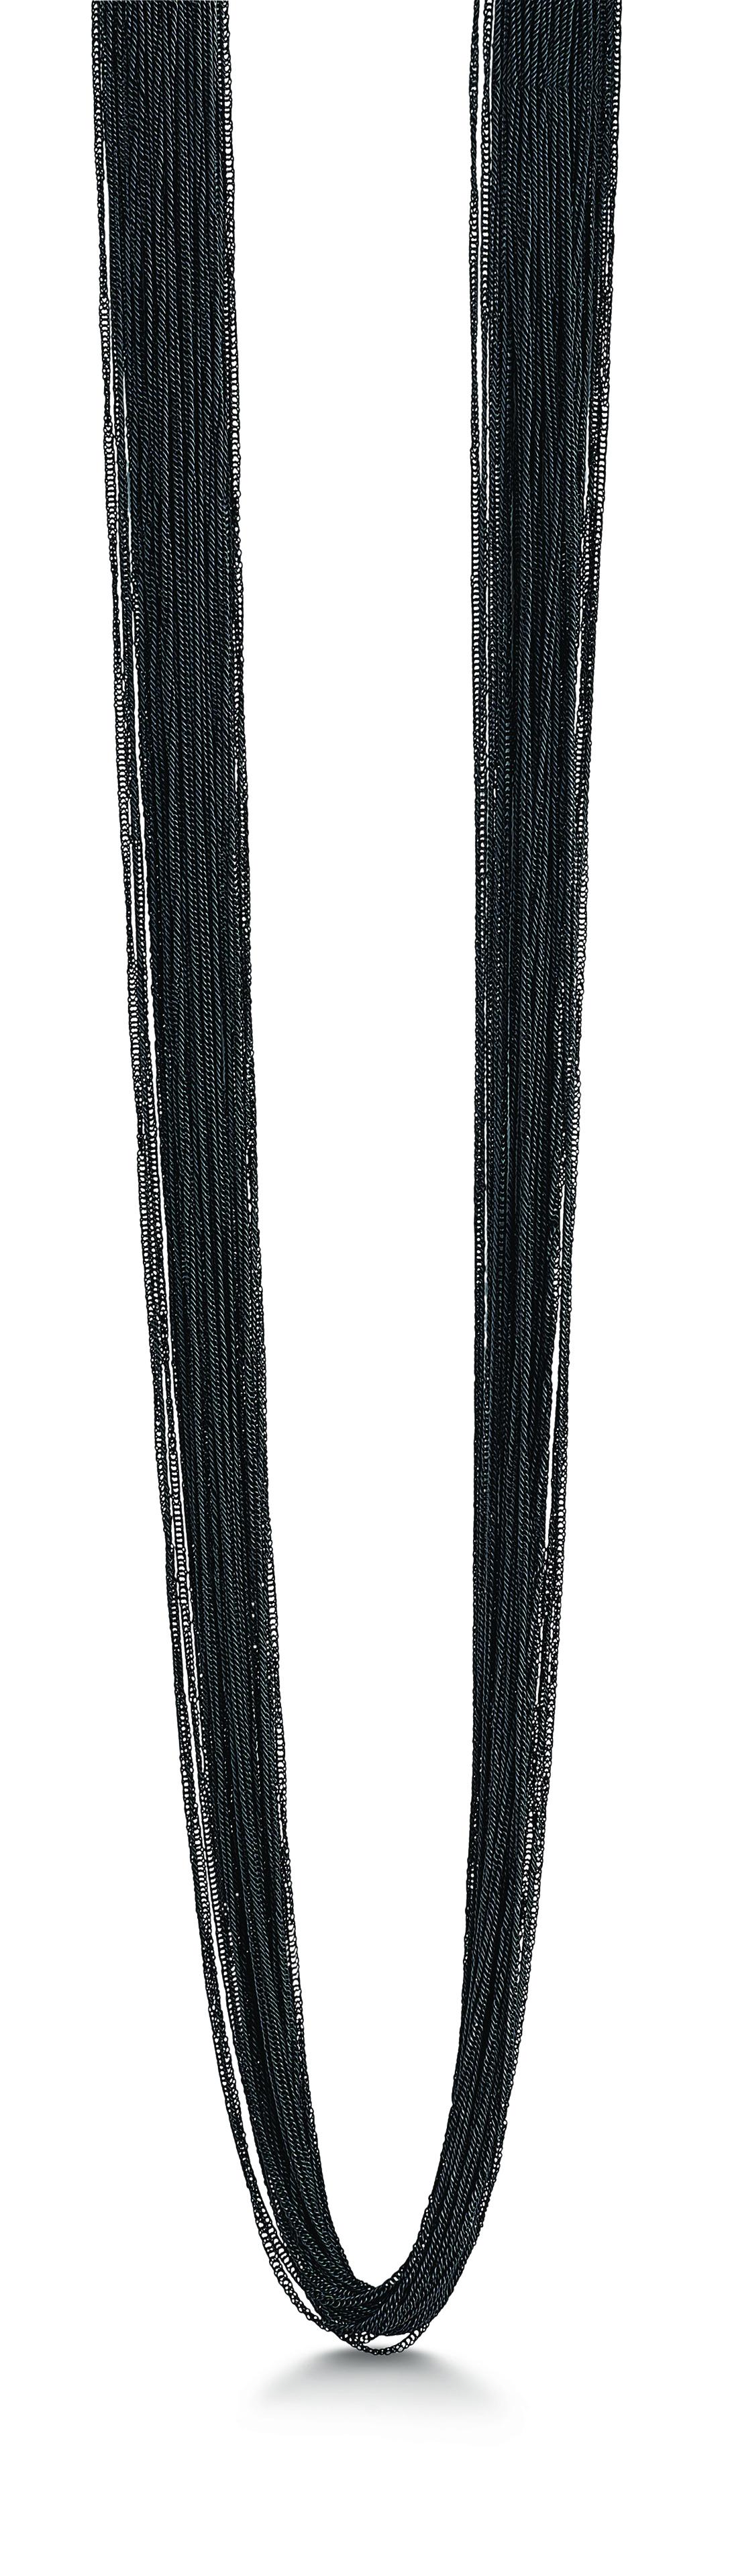 Image of   Kranz & Ziegler stål halssmykke - 1003566-96